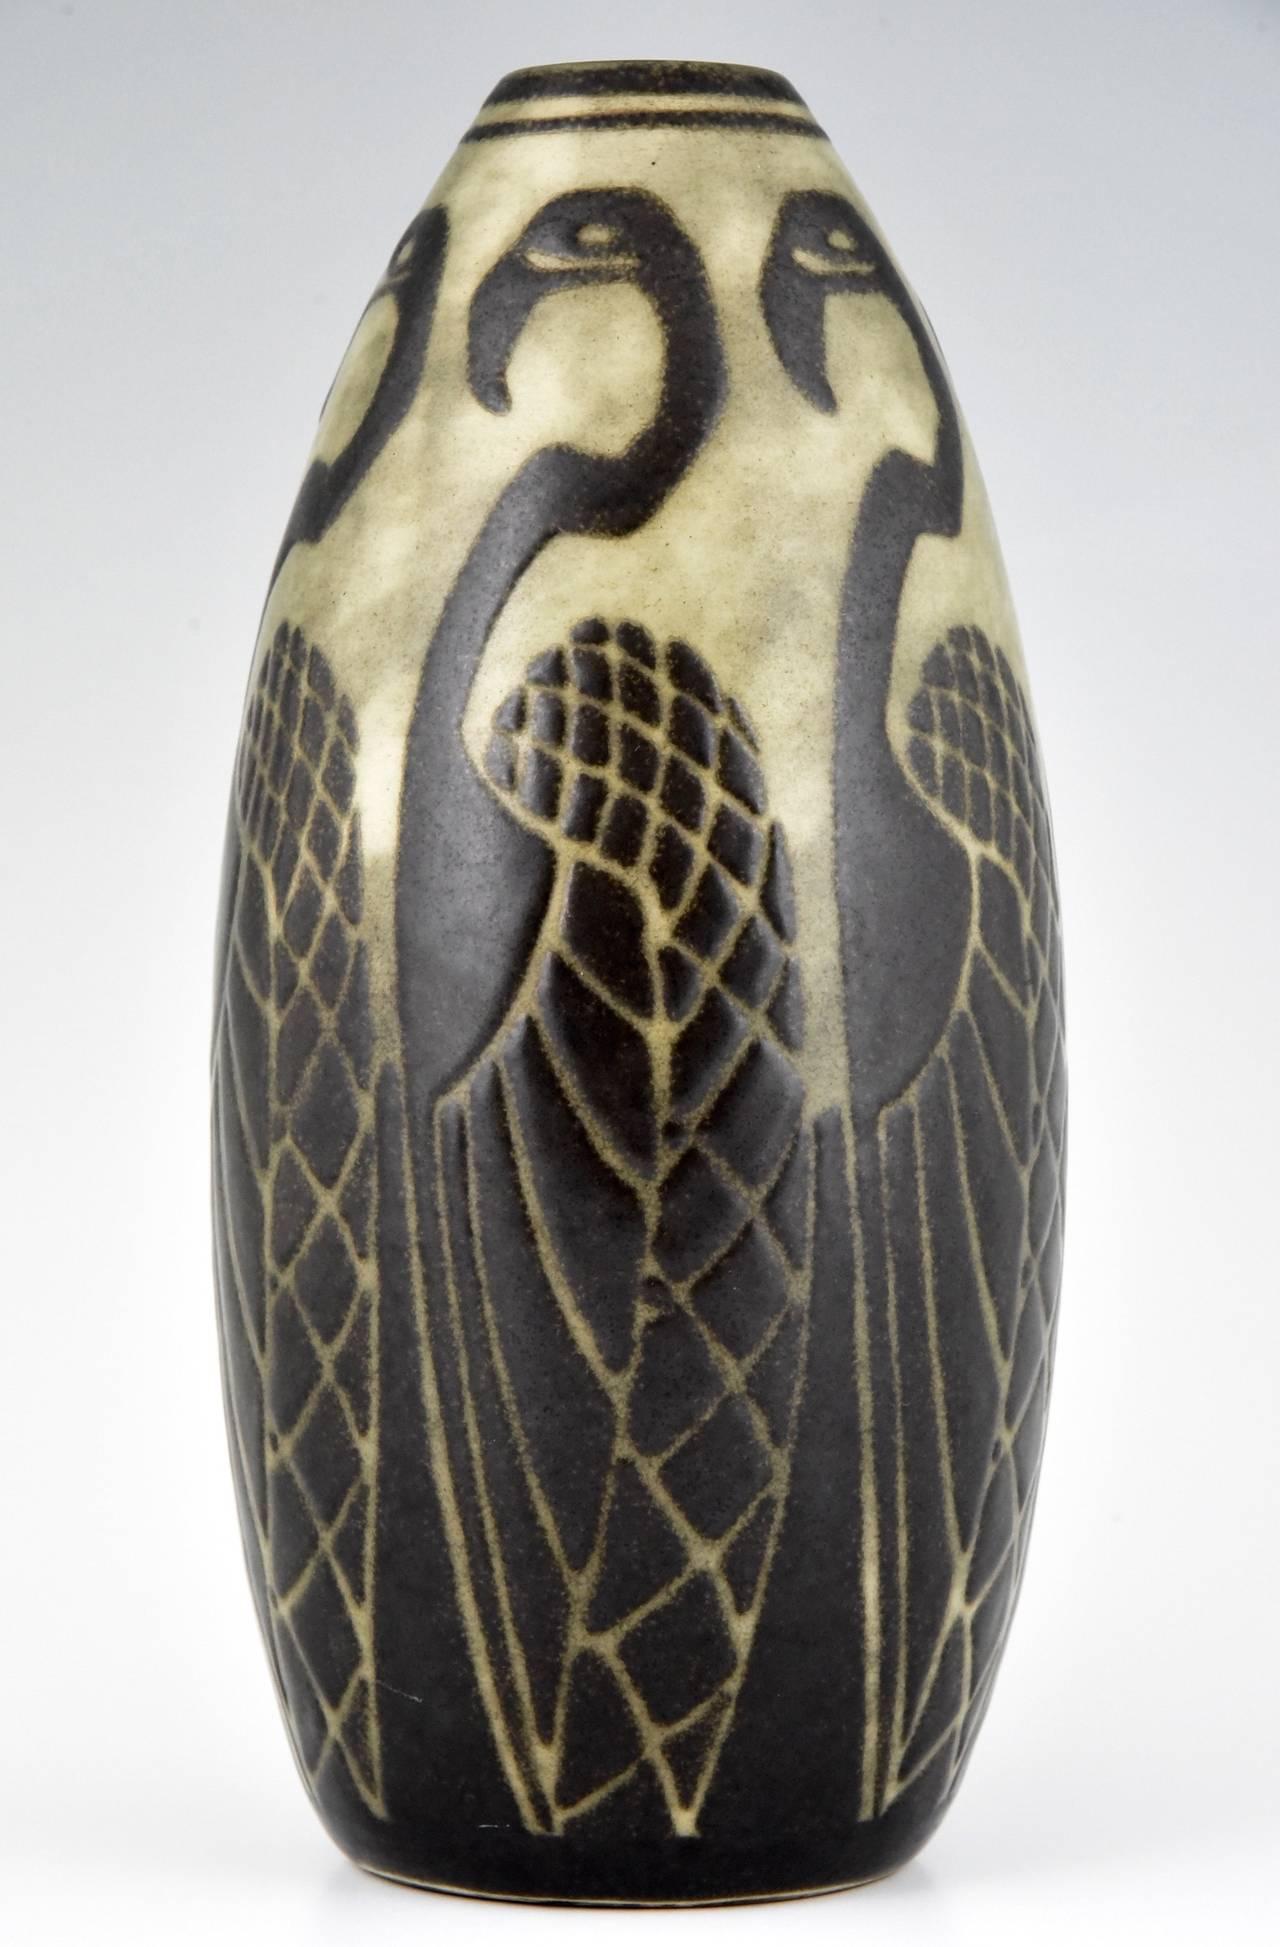 art deco flamingo vase by charles catteau keramis belgium 1924 at 1stdibs. Black Bedroom Furniture Sets. Home Design Ideas